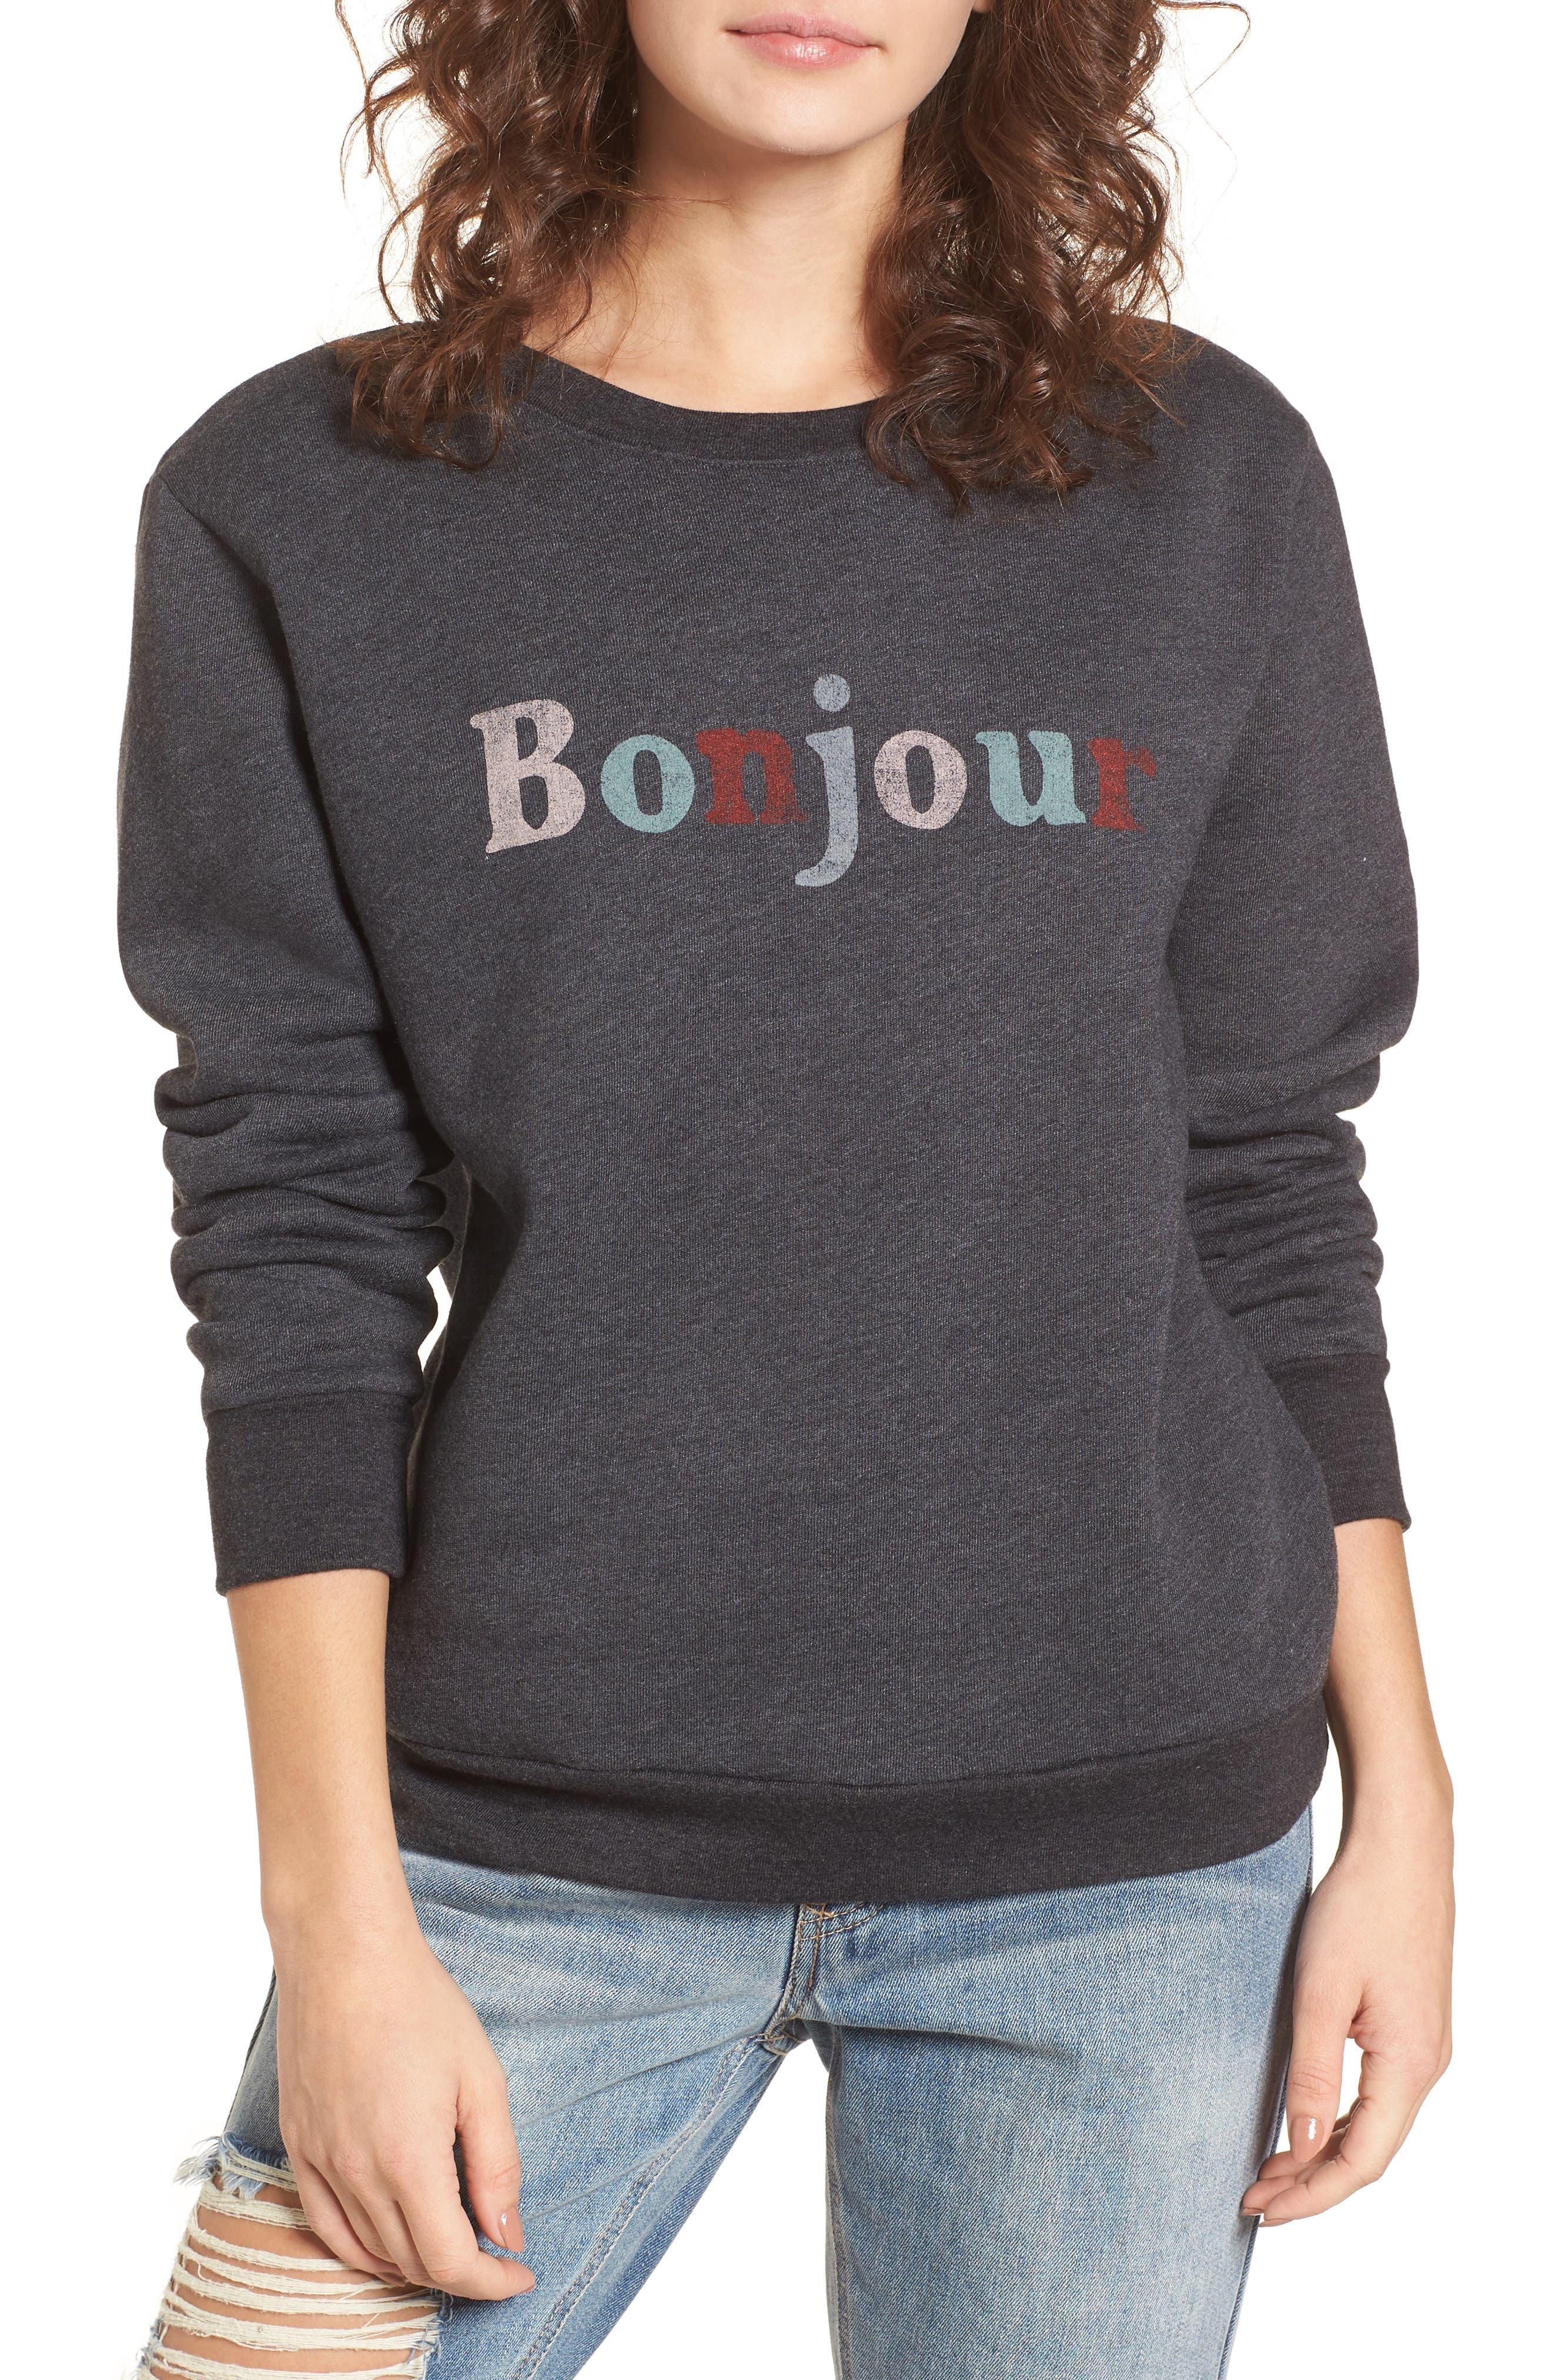 Bonjour Sweatshirt,                         Main,                         color, Faded Black